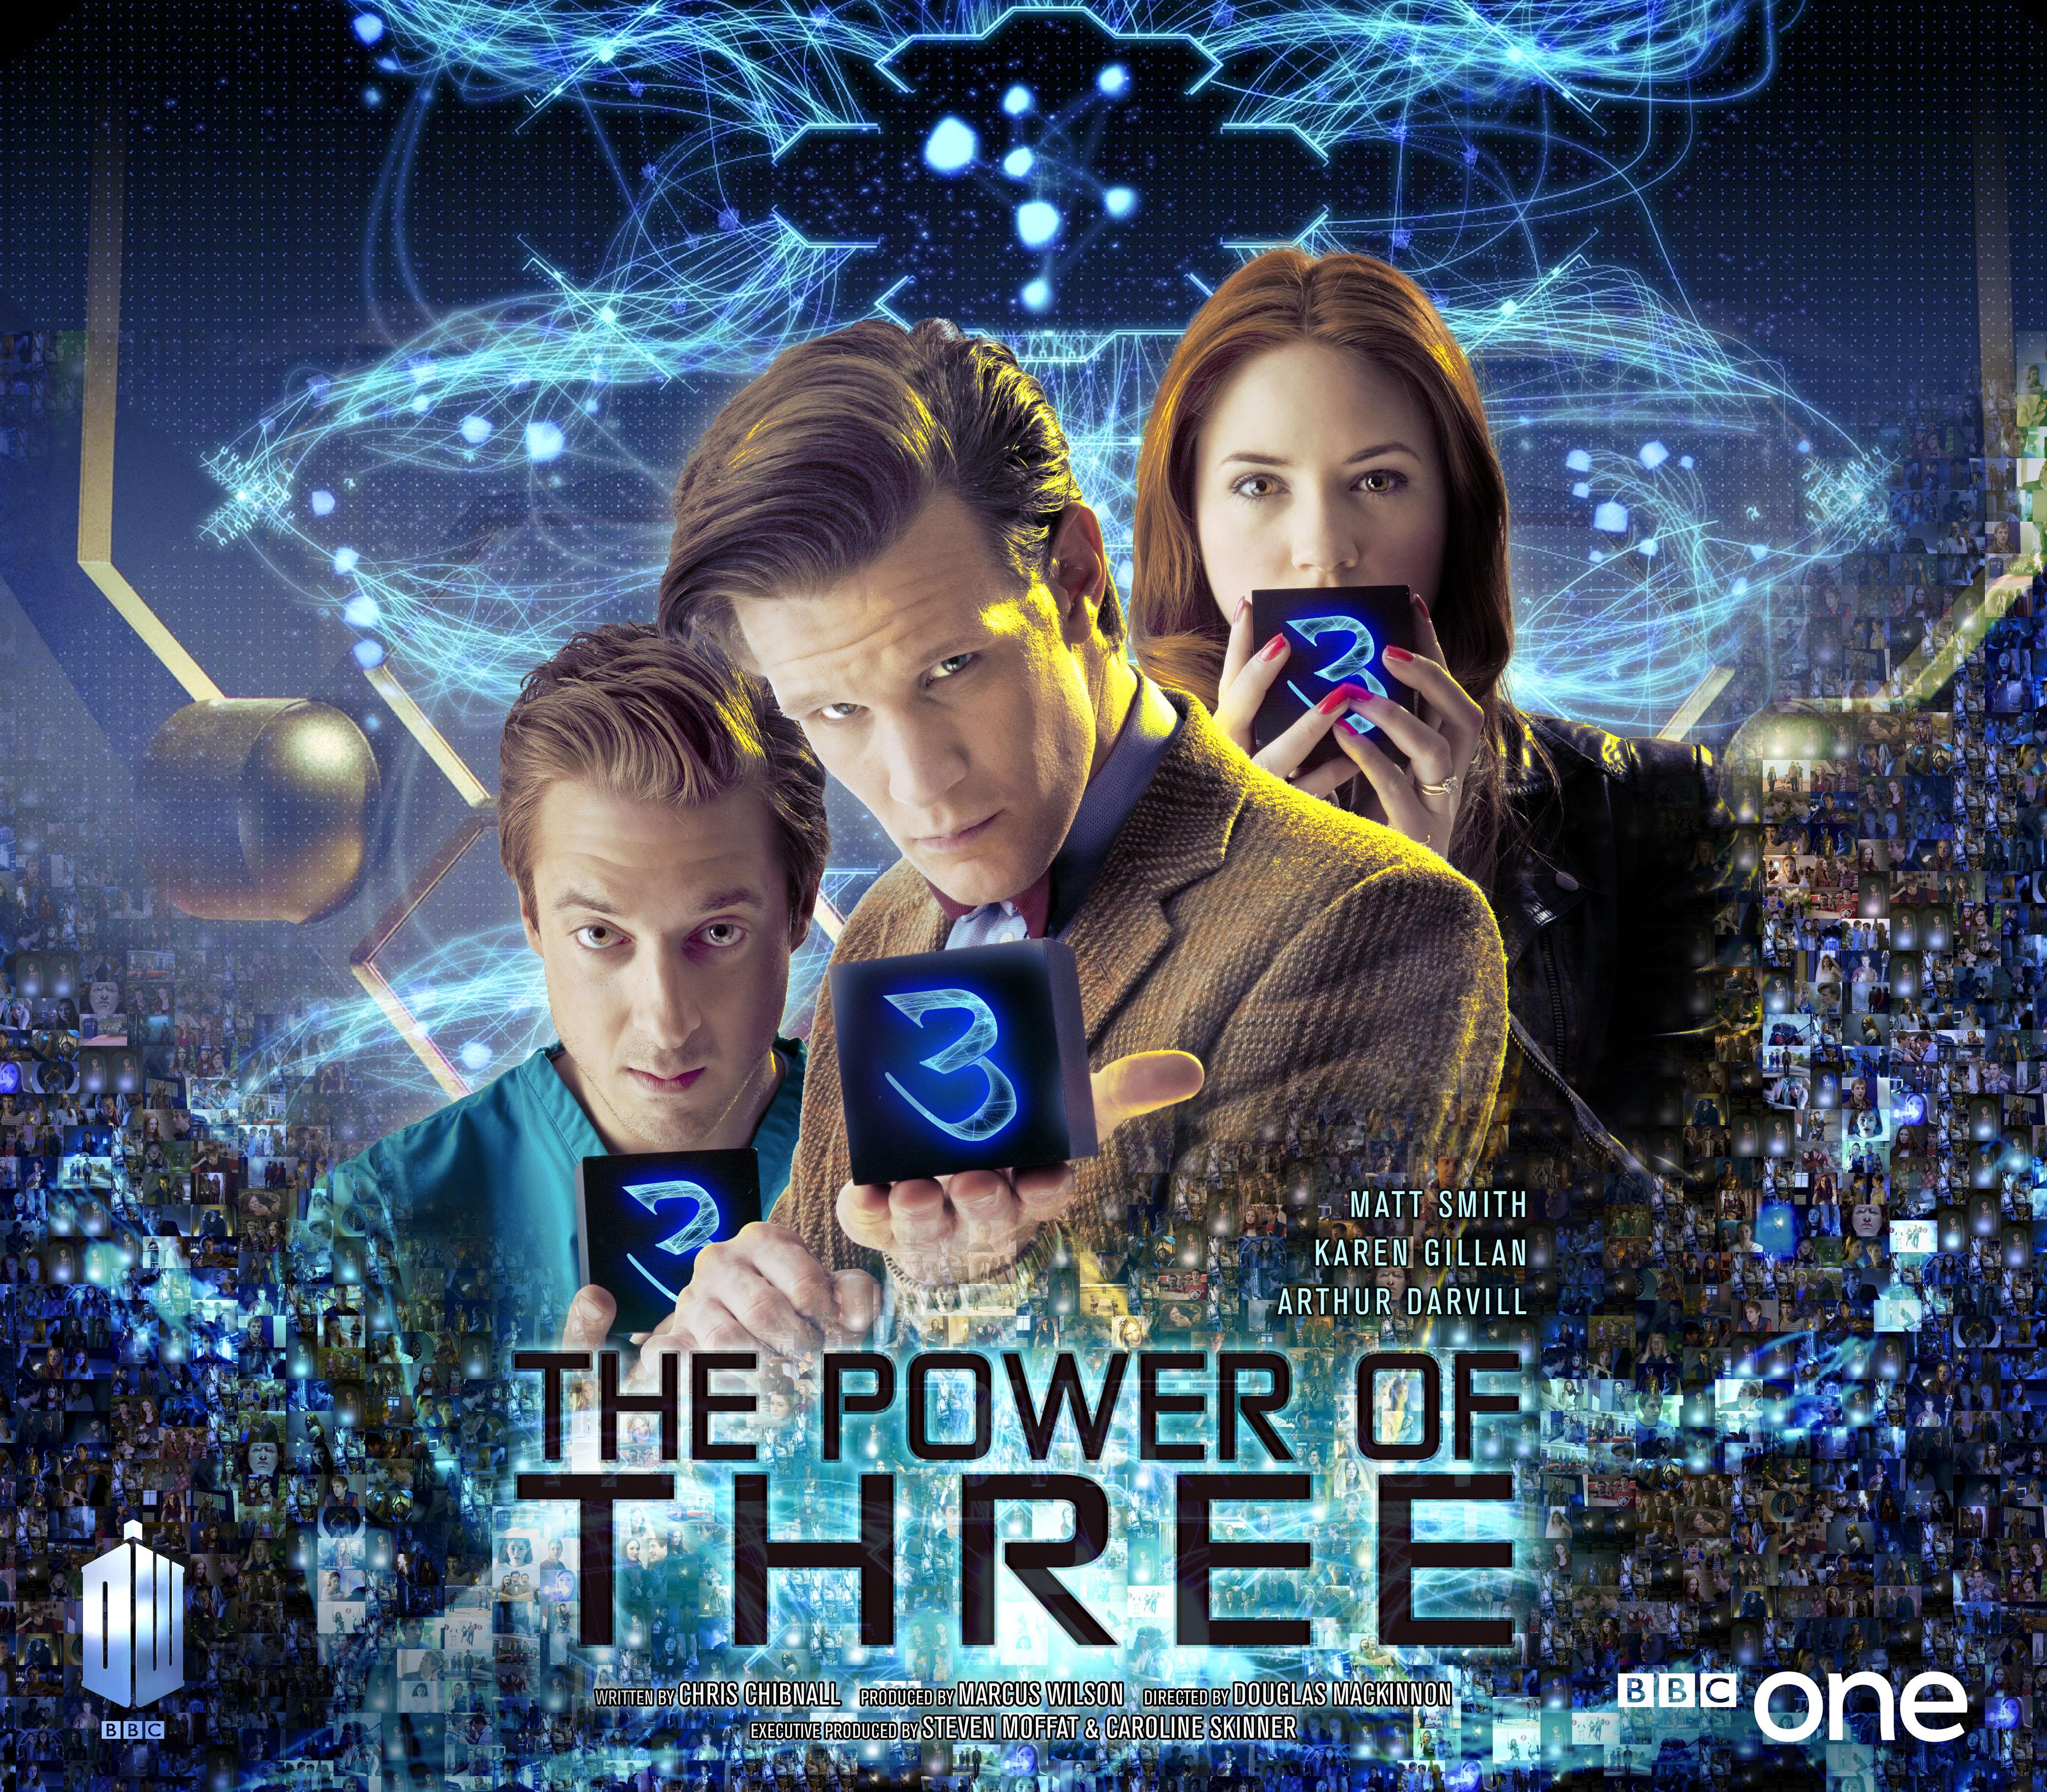 Series 10 (Doctor Who) | Tardis | FANDOM powered by Wikia